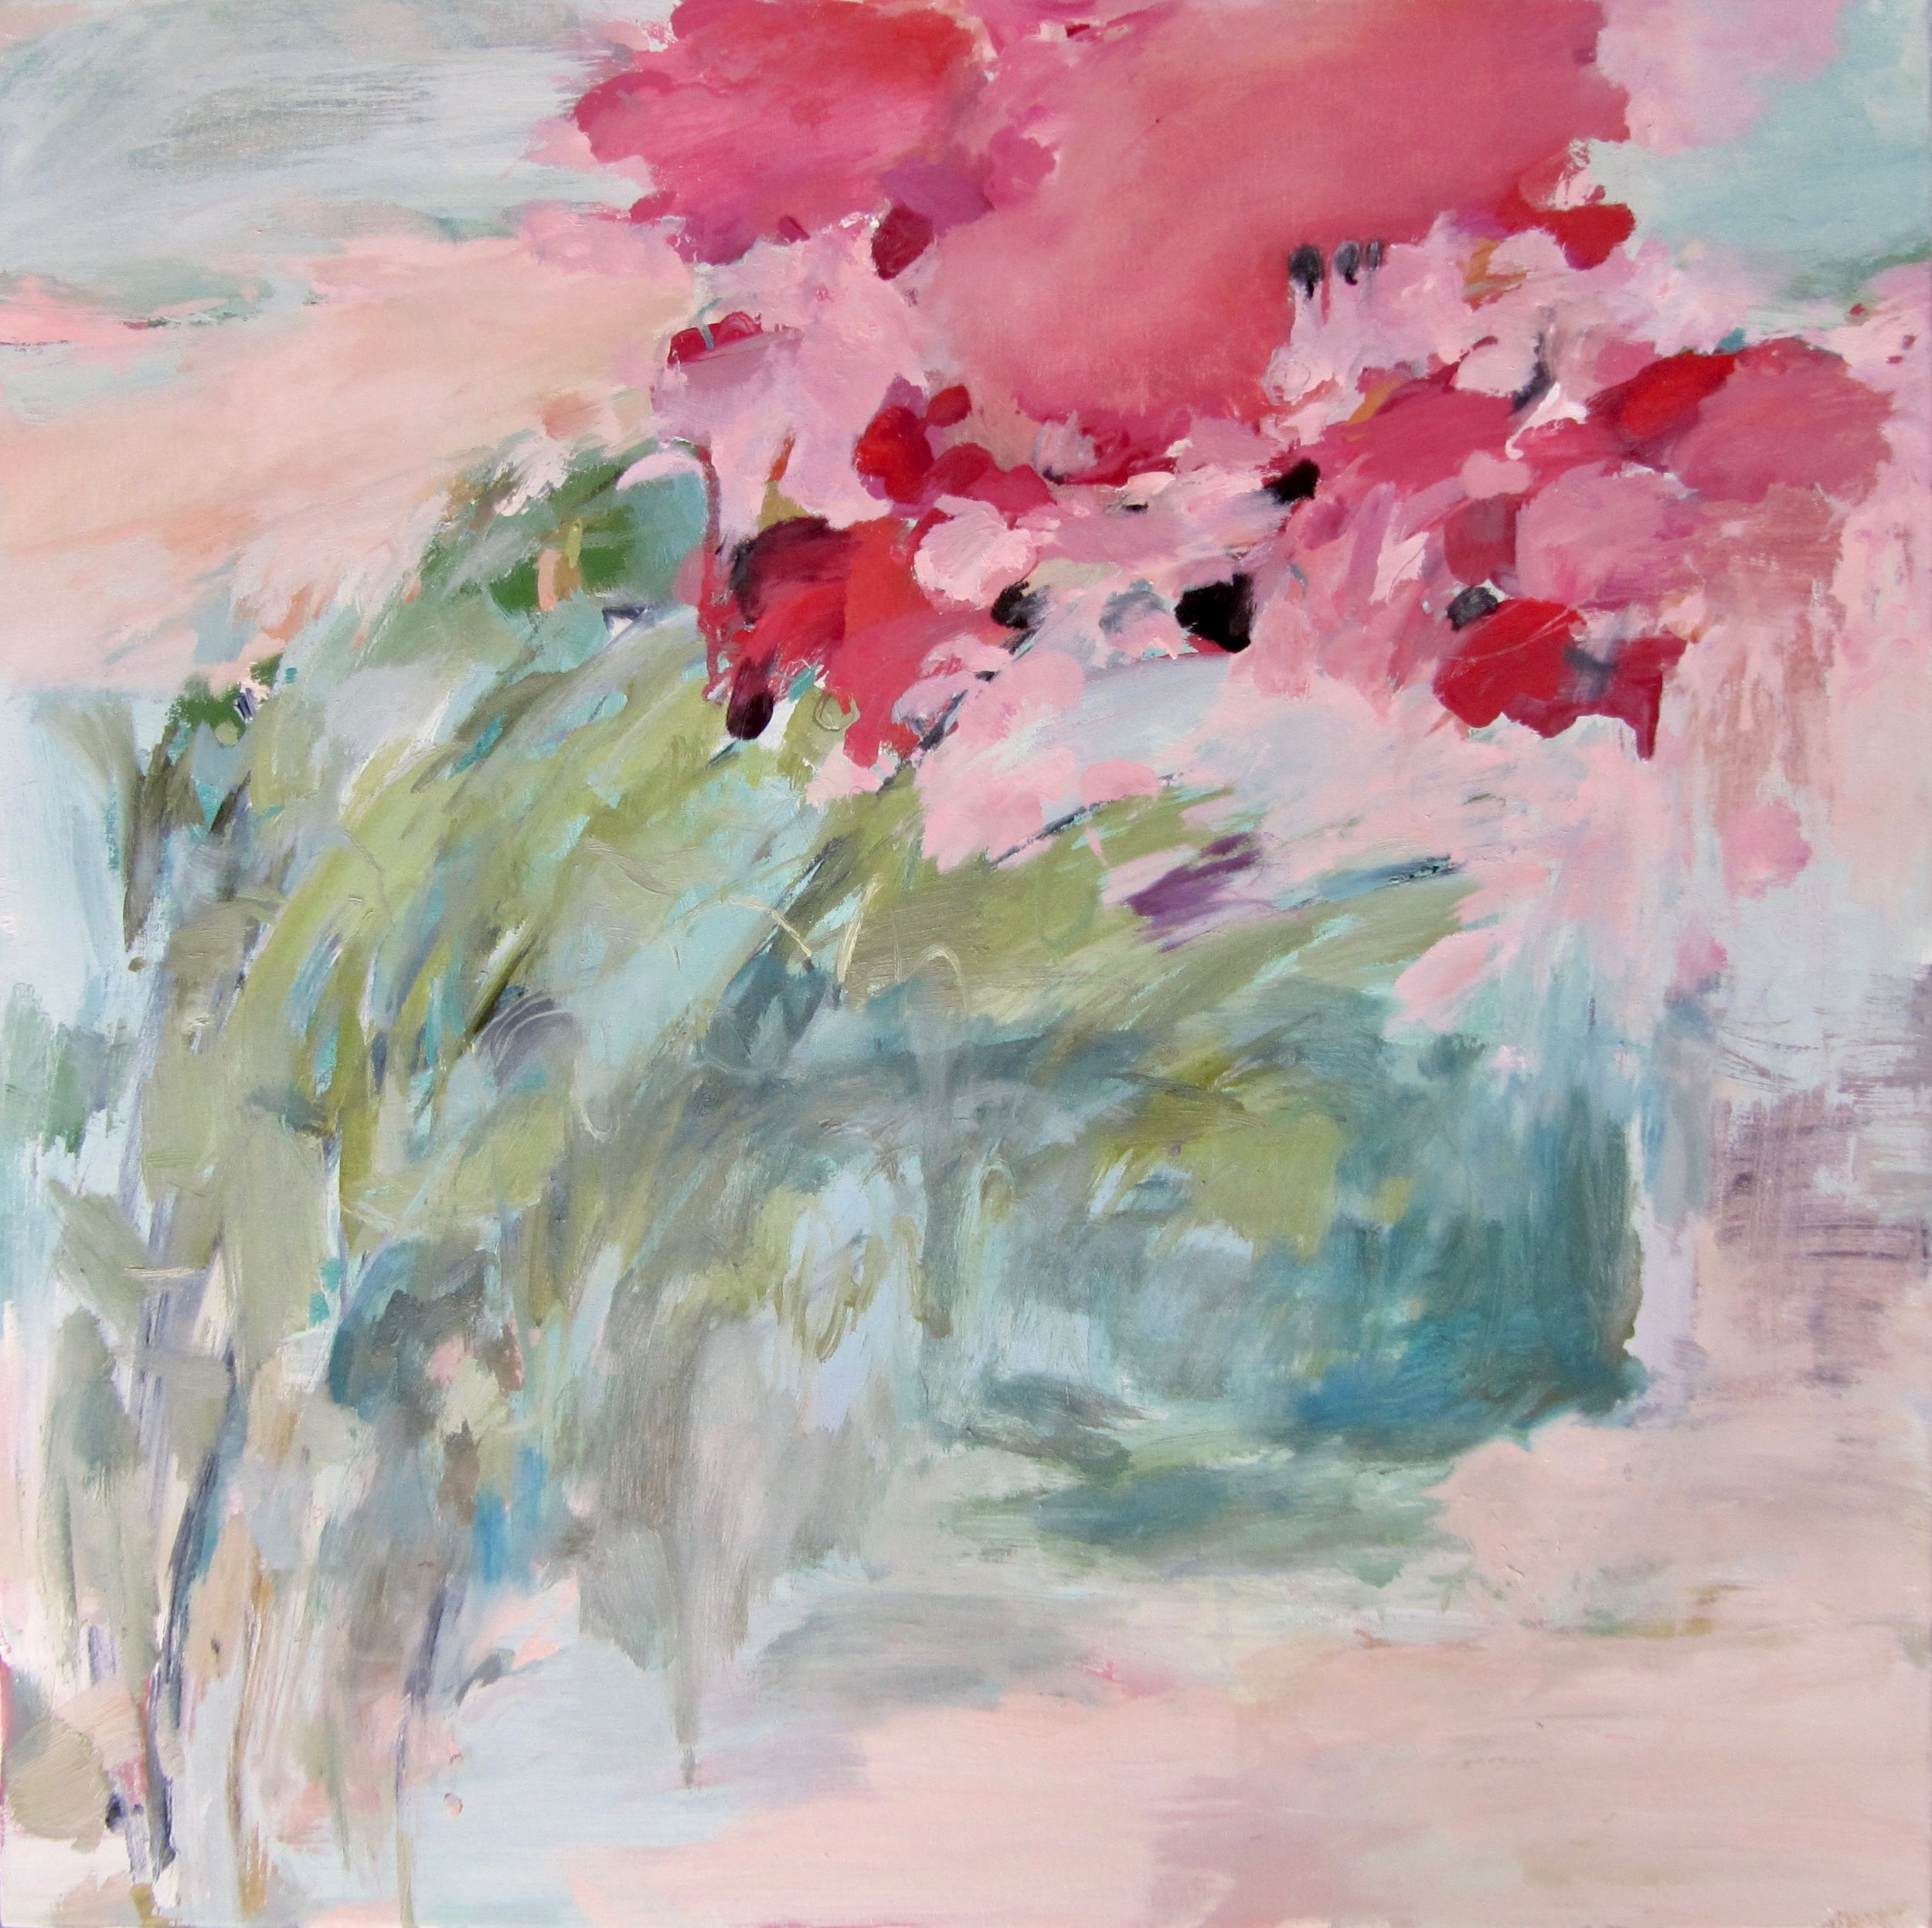 Borrowed Roses, 2018 / Oil on canvas, 24 x 24